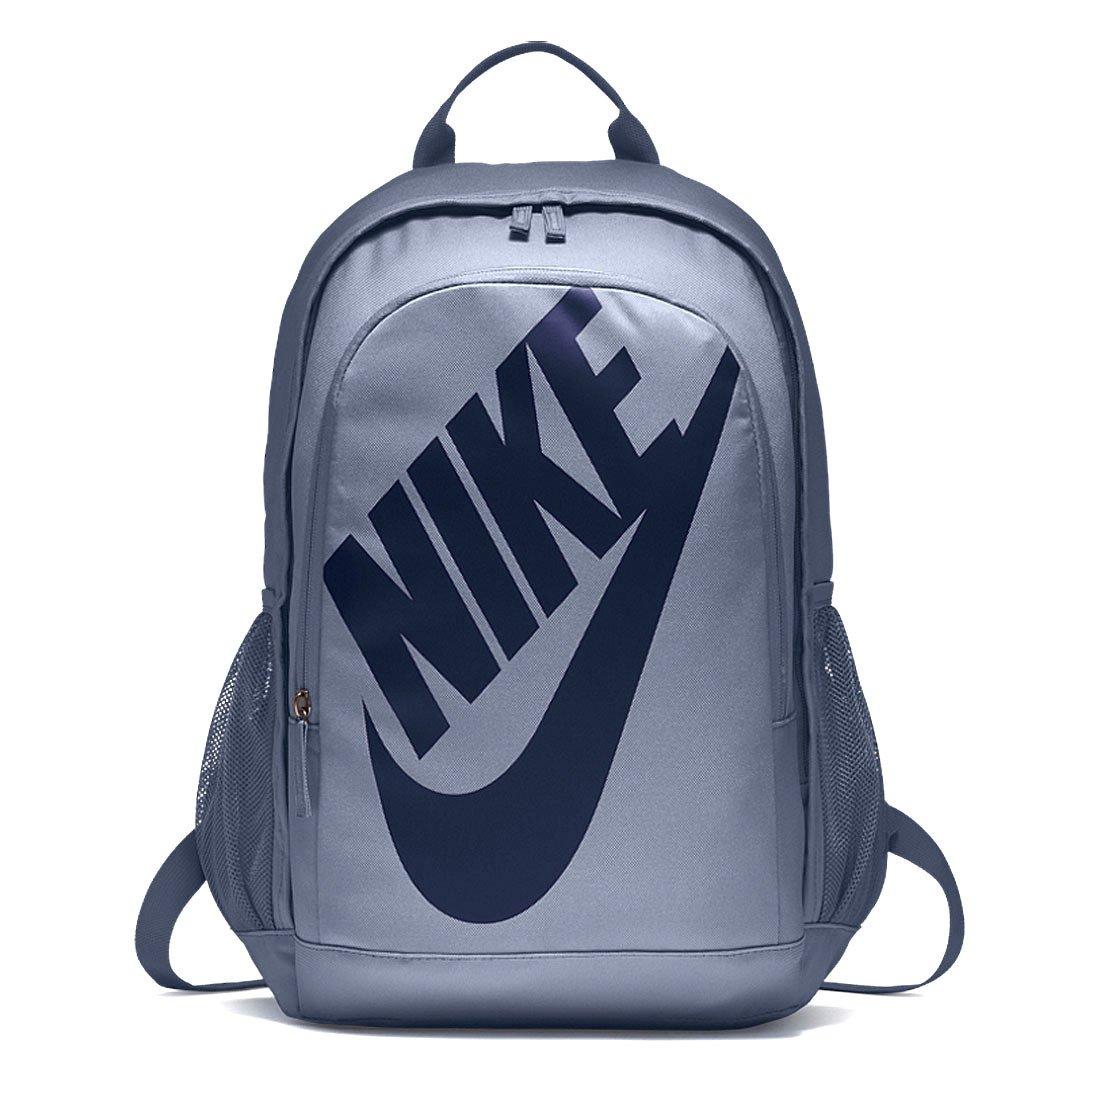 dfae584eb78d9 ... Szary plecak szkolny Nike Hayward Futura BA5217-445 ...